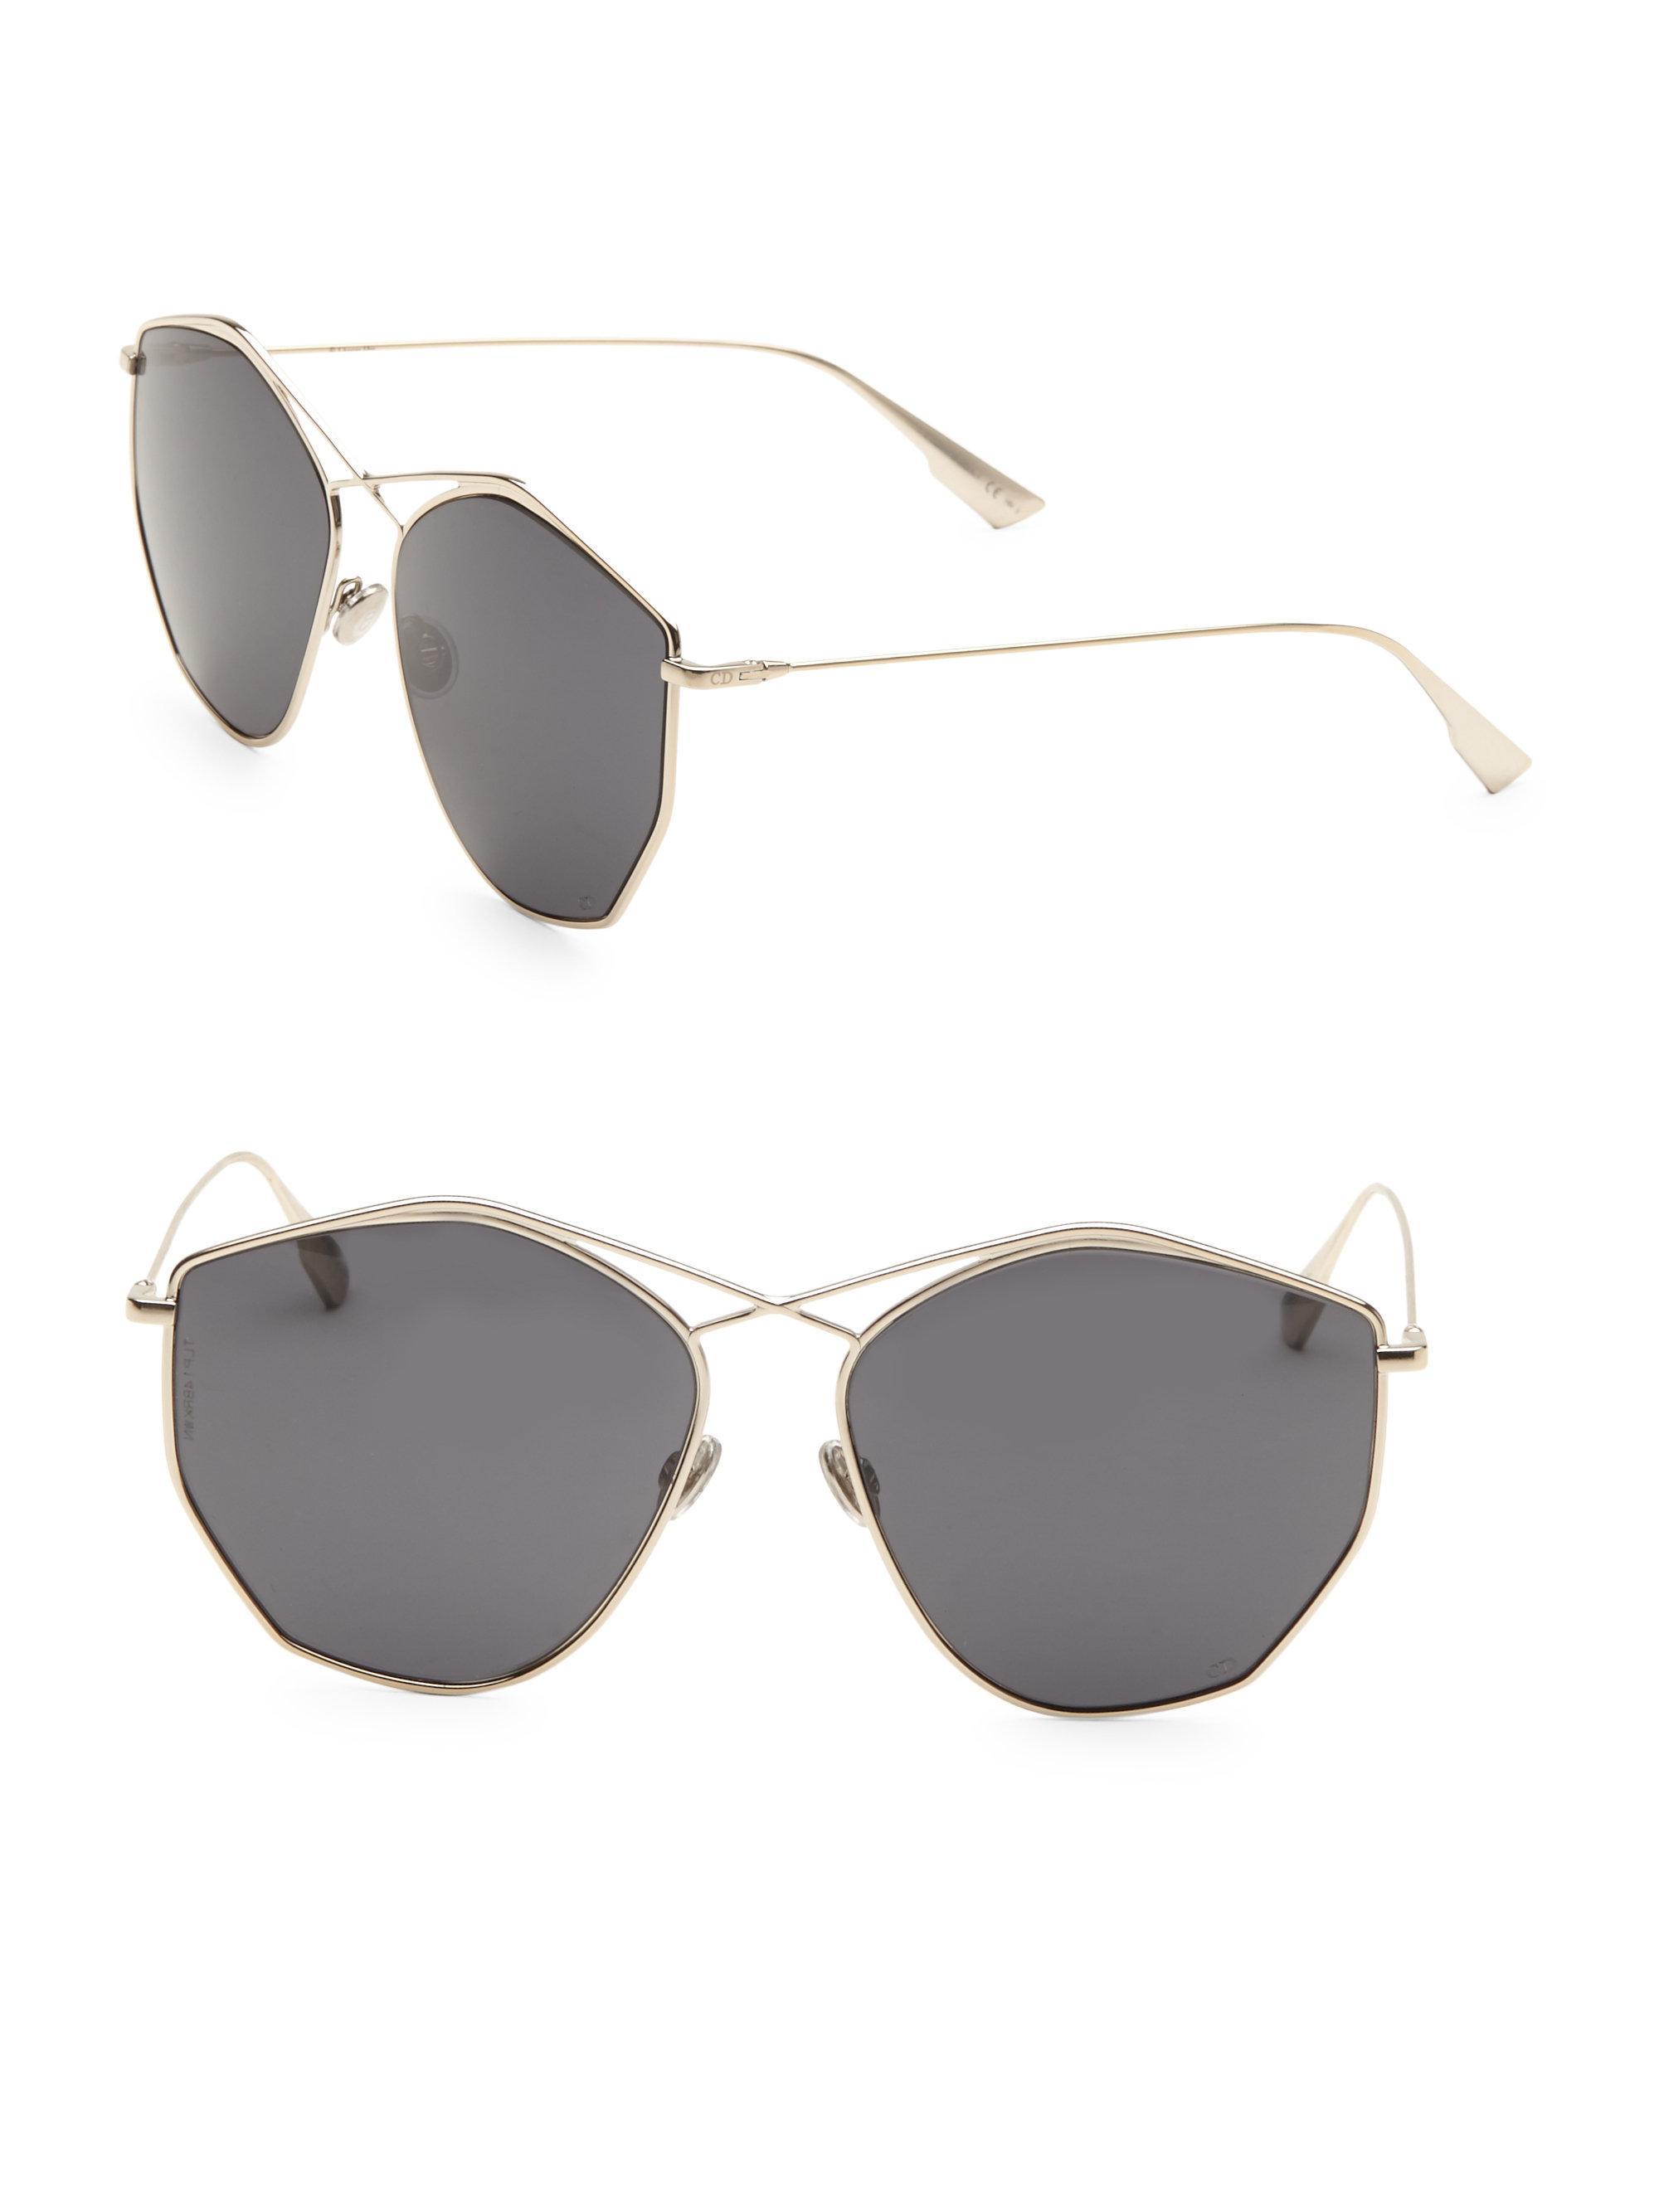 43a119d5b75 Dior Stellaire 59mm Round Sunglasses in Metallic - Lyst